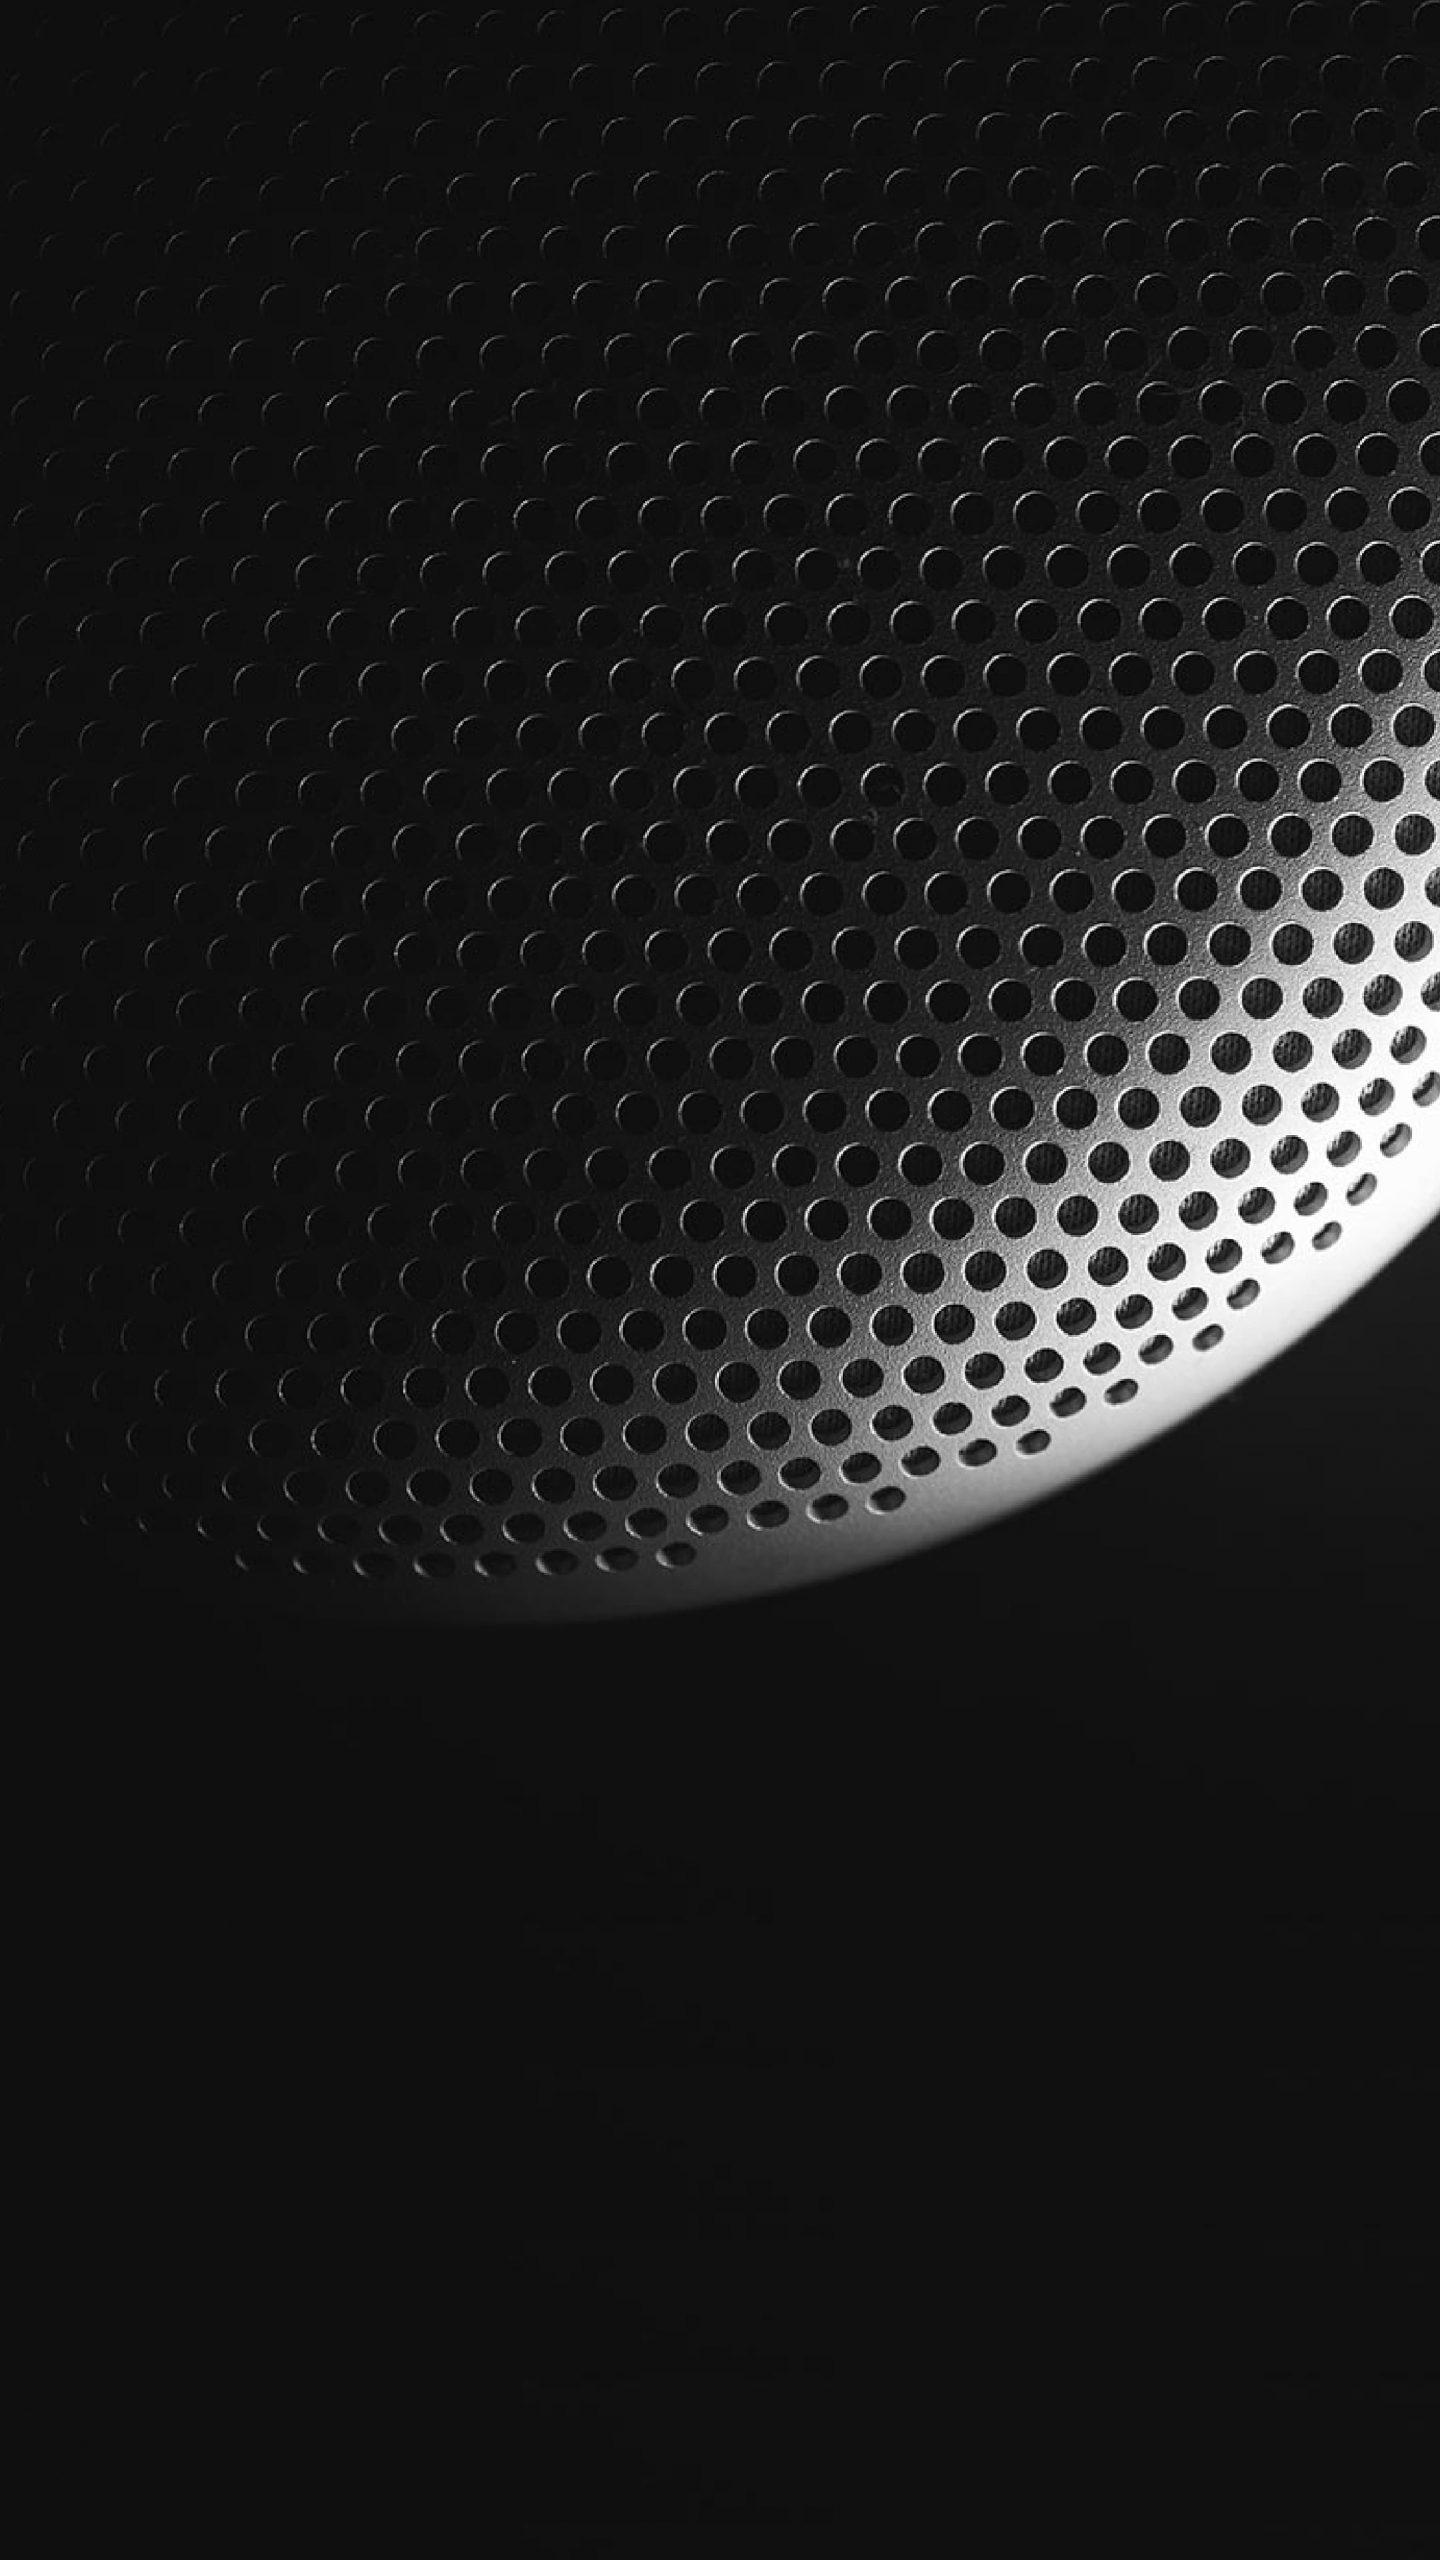 Lowering the noise floor